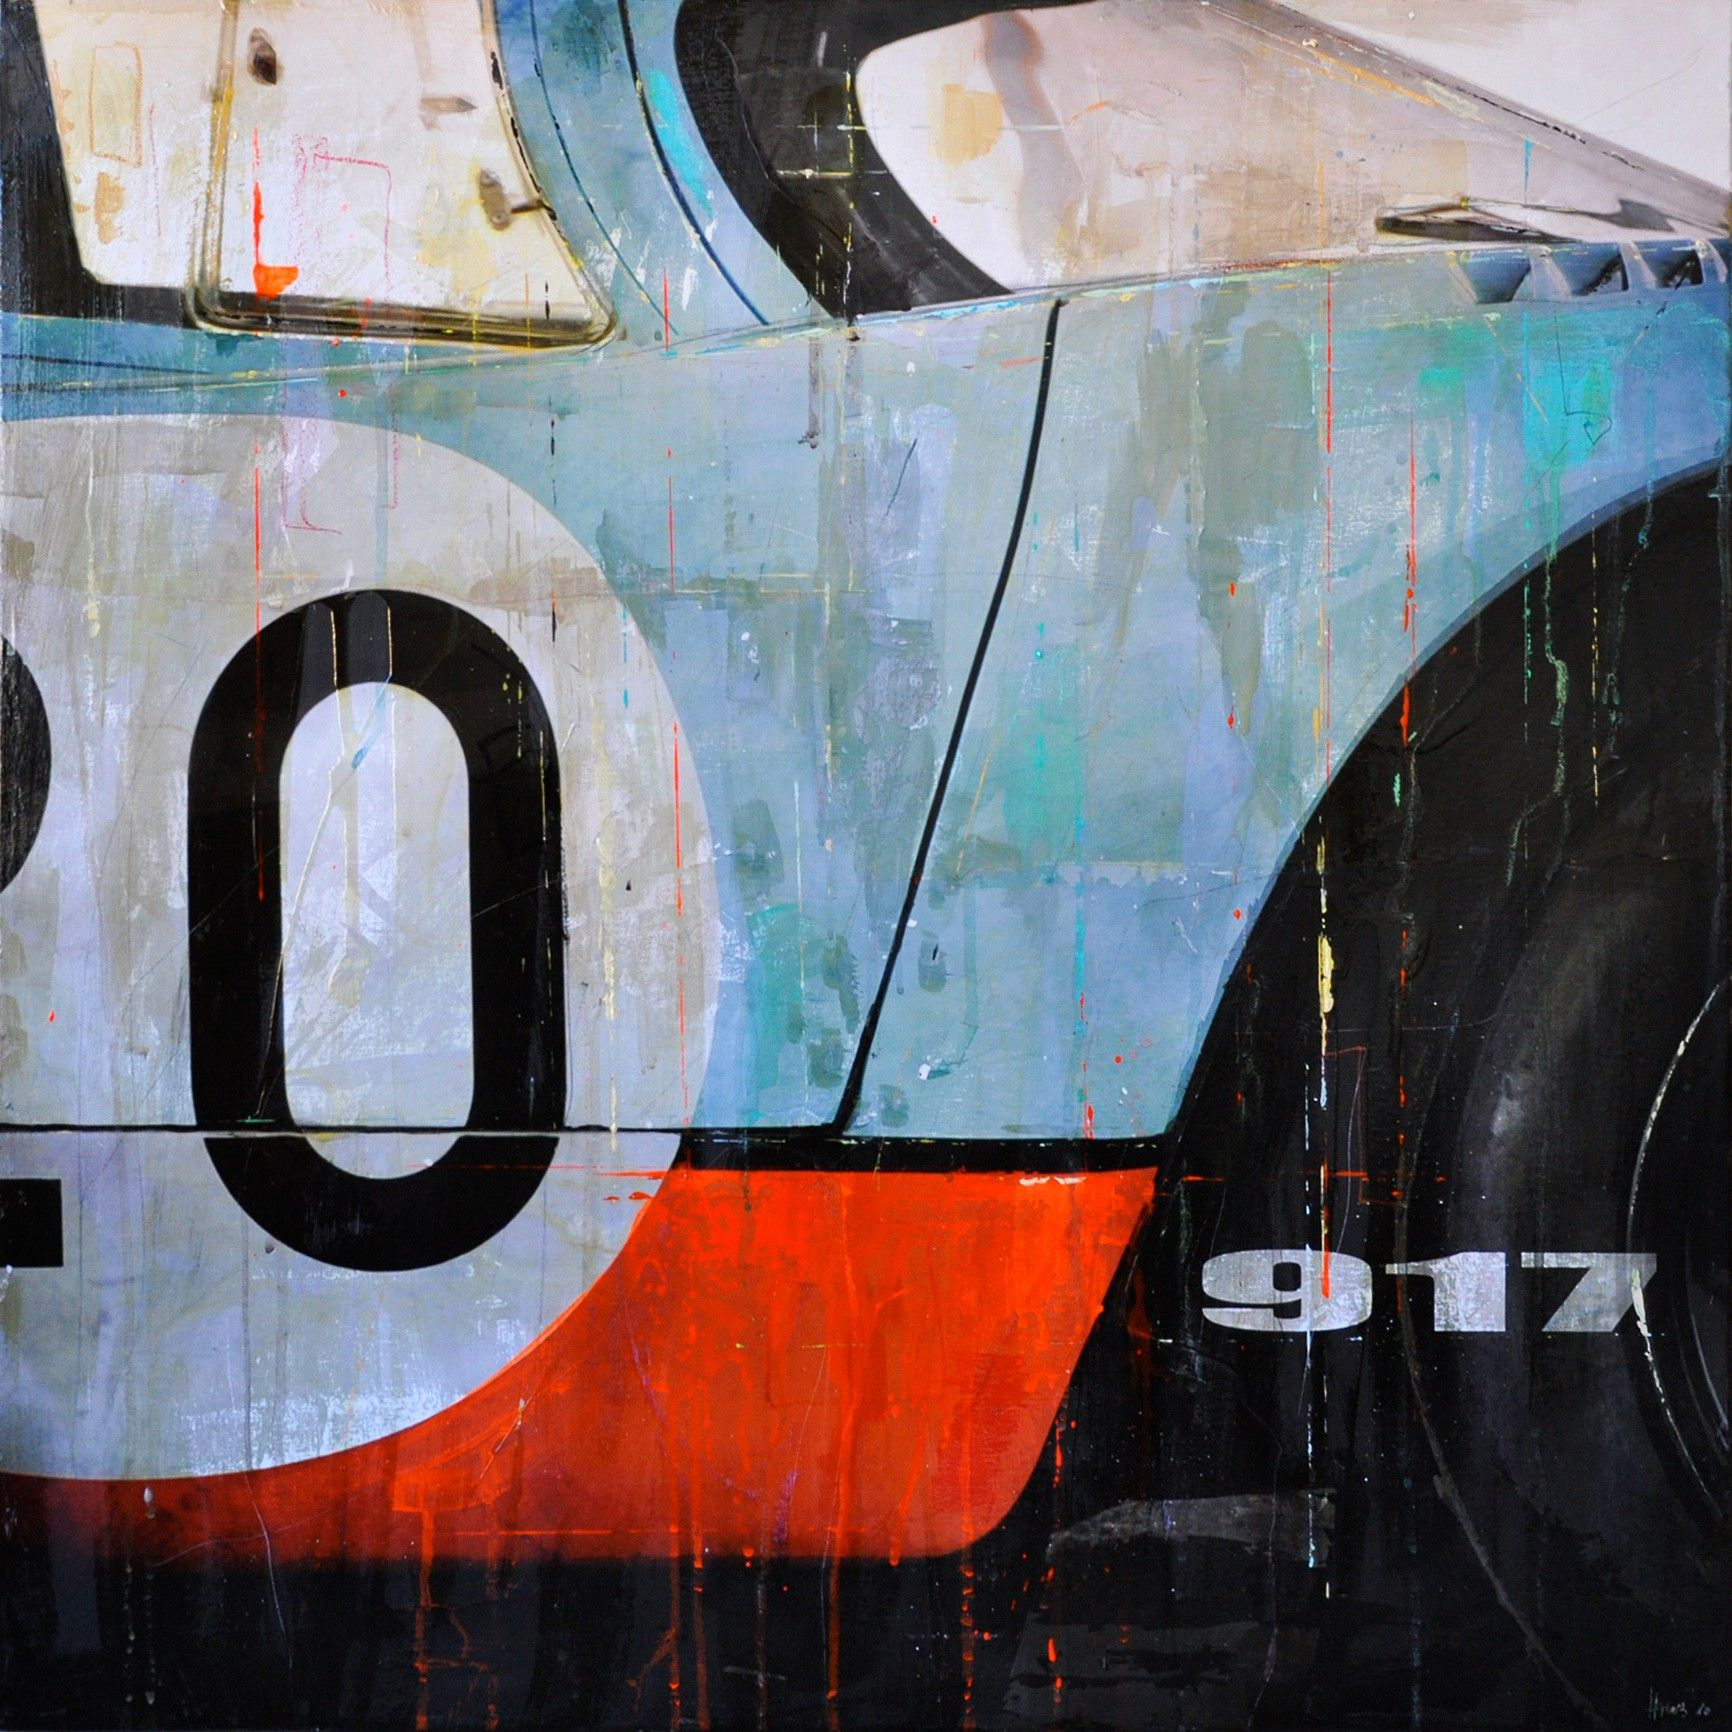 Markus Haub Porsche 917 - Le Mans - ... Edition auf Metall (Dibond) ab 25 x 25 cm ab  49,00 € http://www.artfan.de/haub-markus-porsche-917-le-mans-steve-mcqieen-blau-kunst-kaufen-junge-kunstler.html